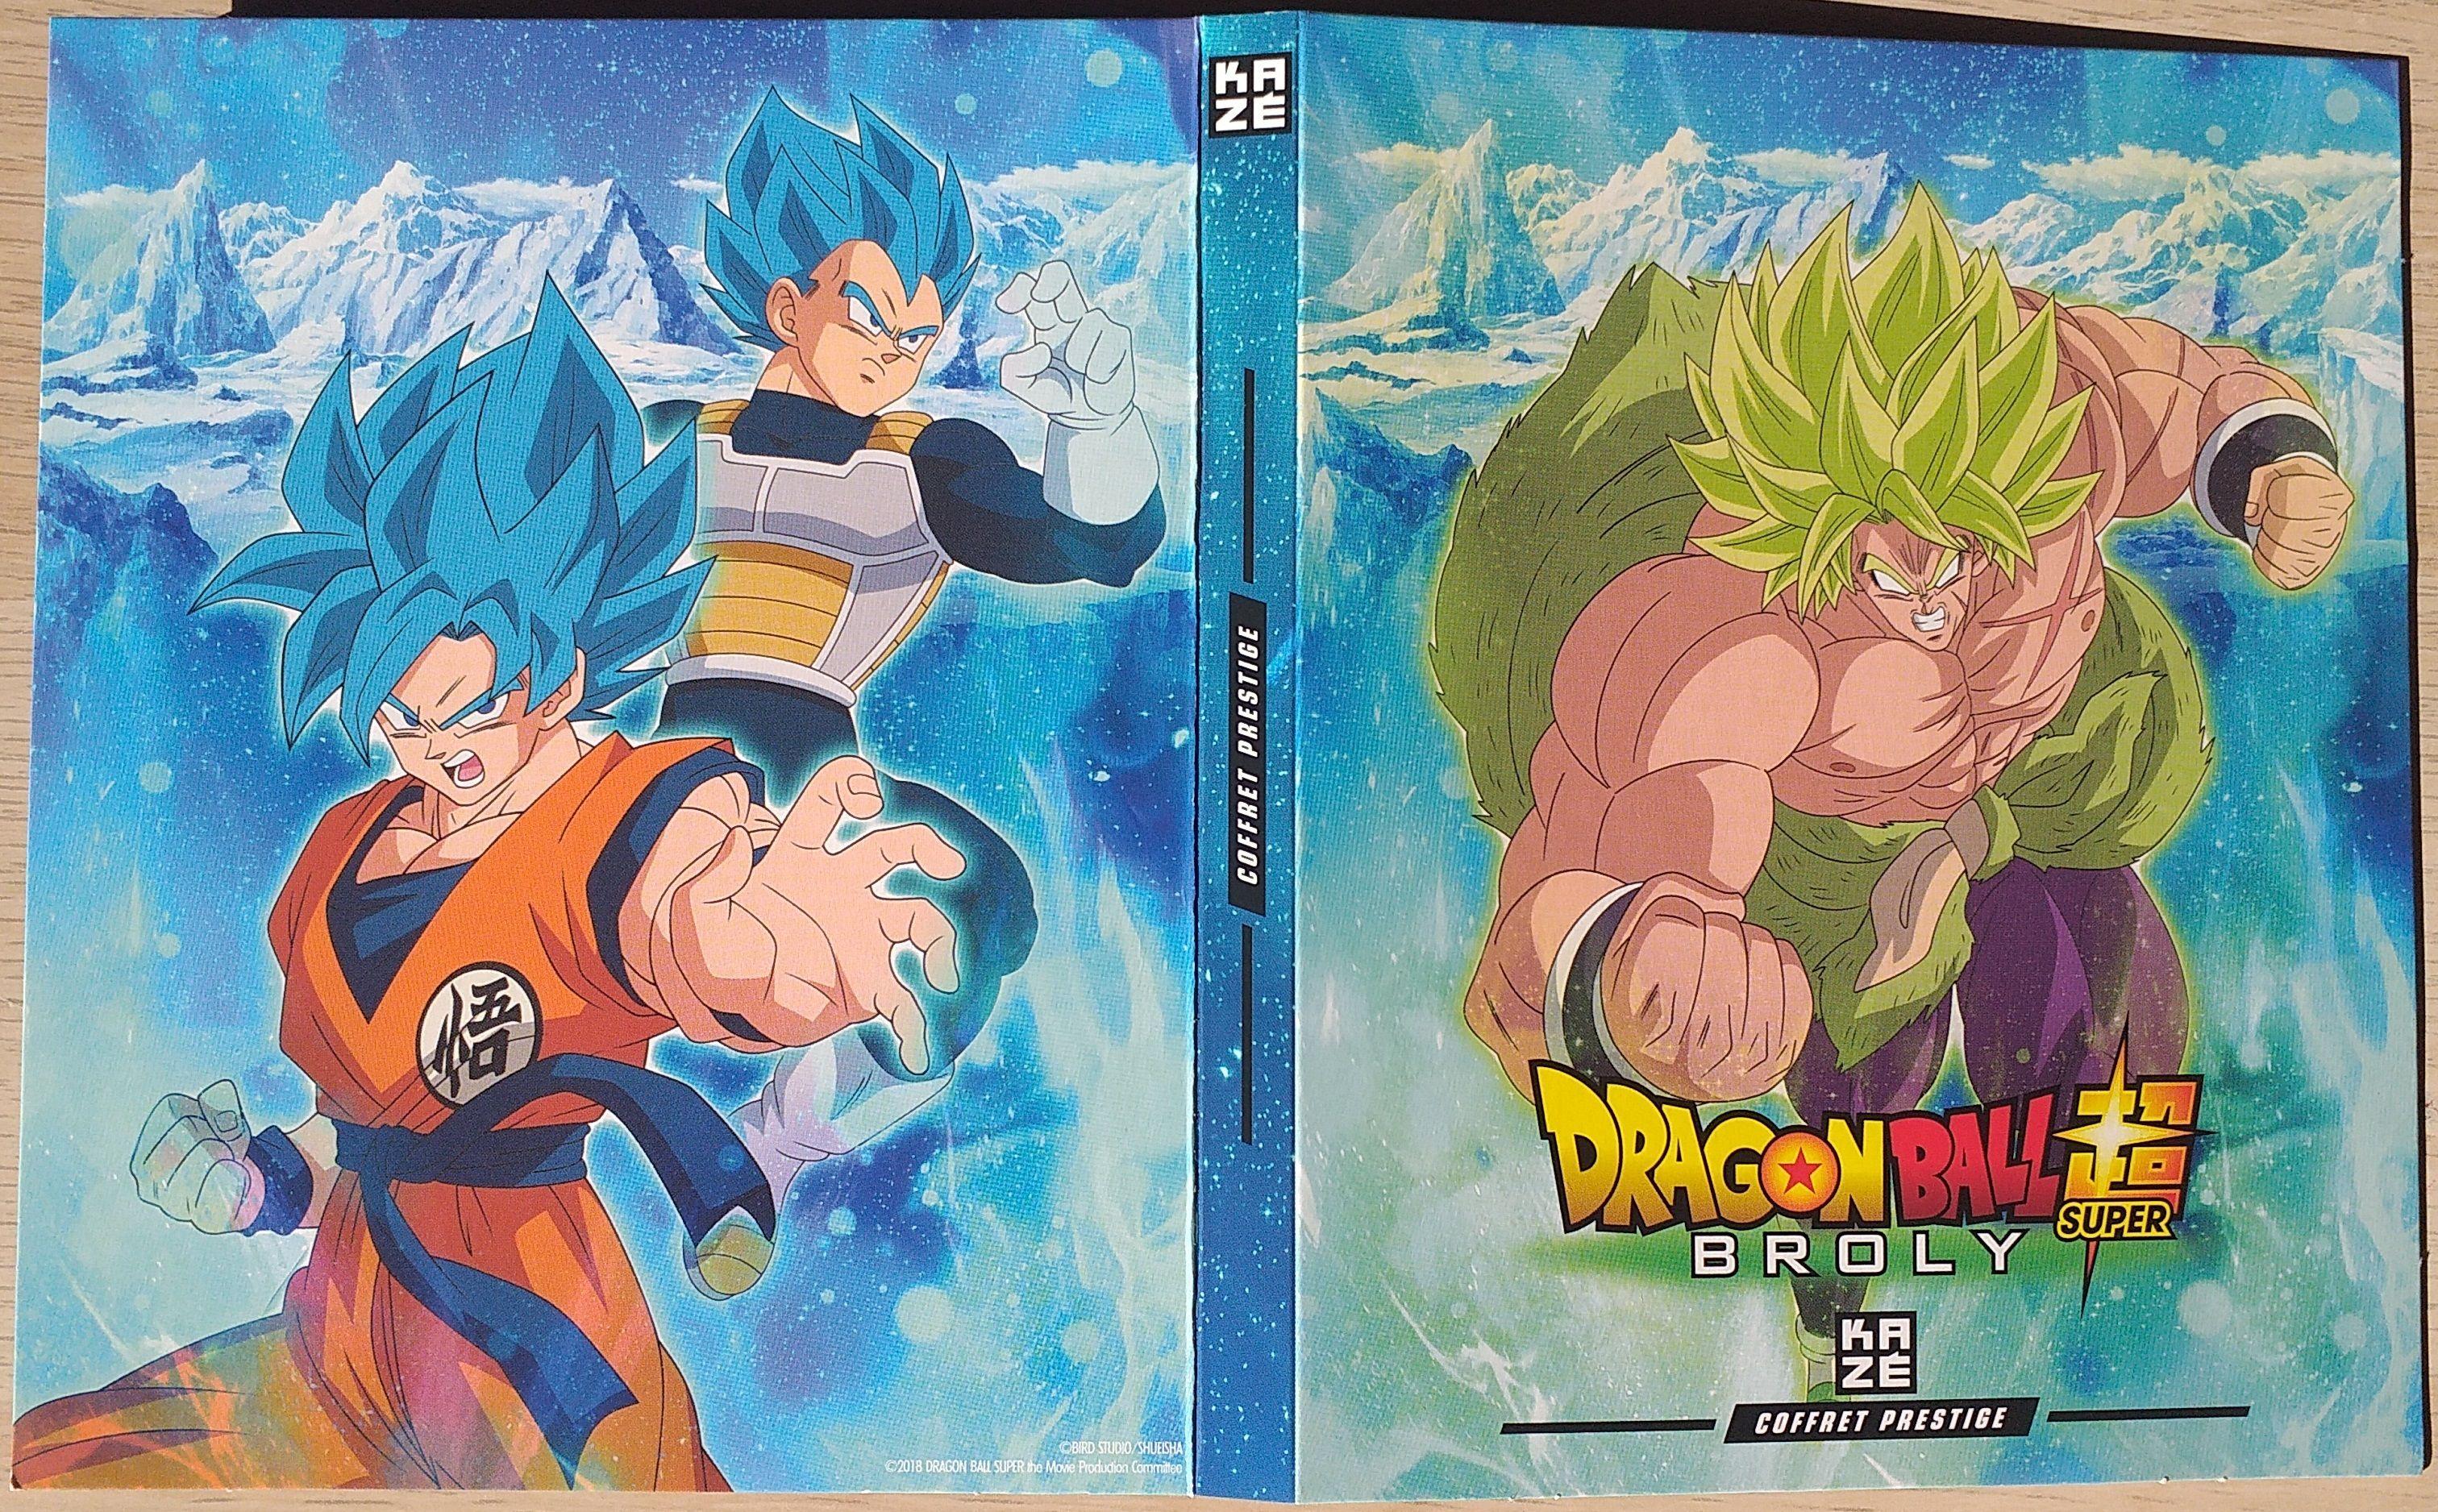 Dragon-Ball-Super-Broly-coffret-prestige-unboxing-2.jpg